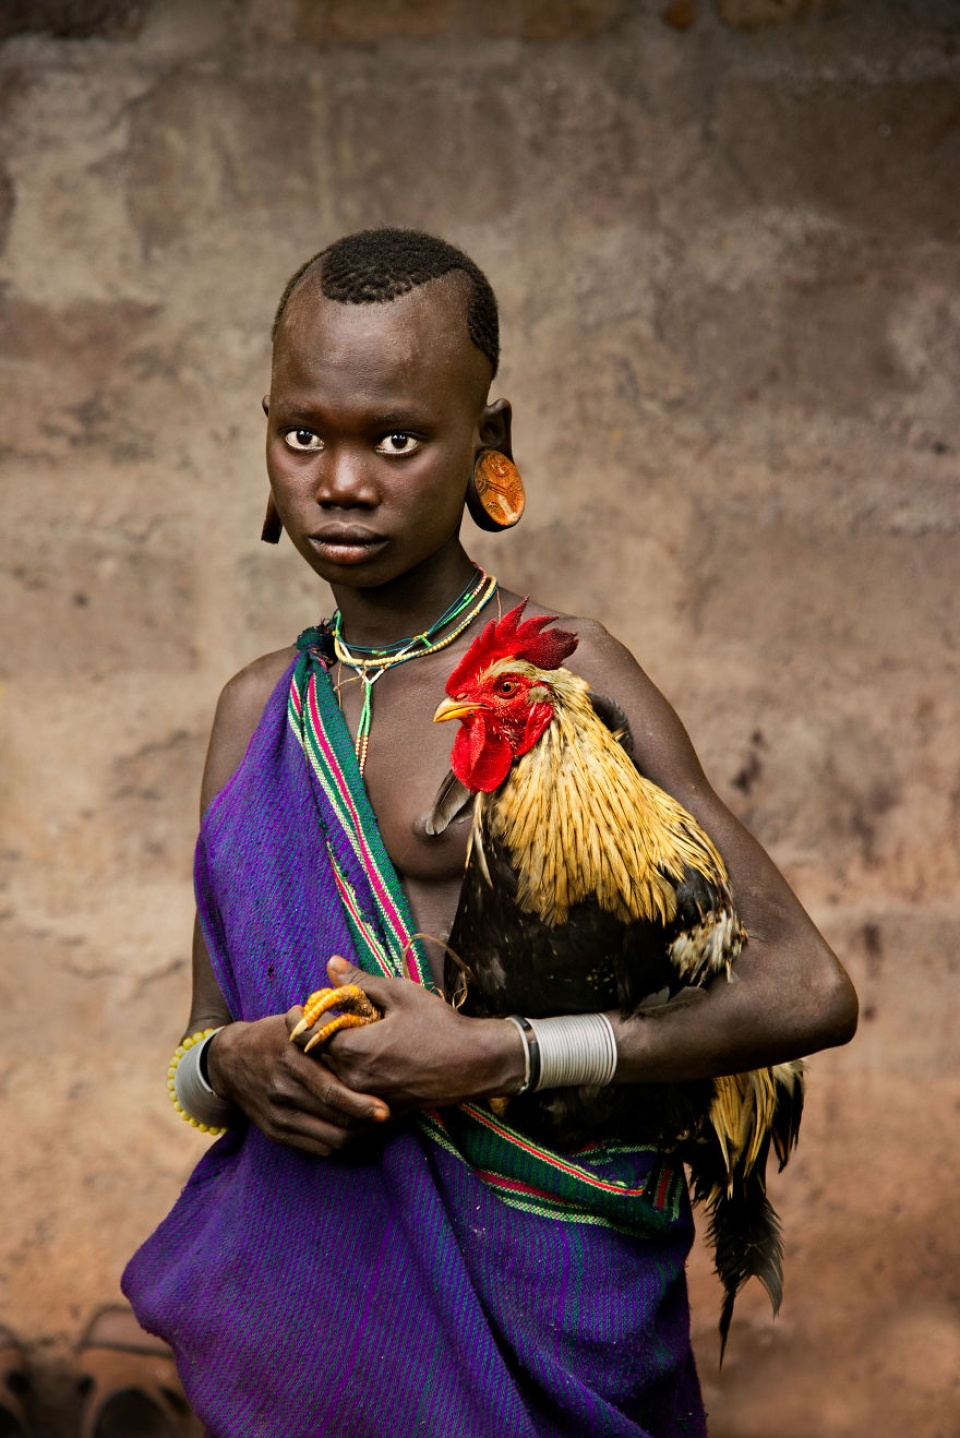 Steve McCurry. Omo Valley, Ethiopia